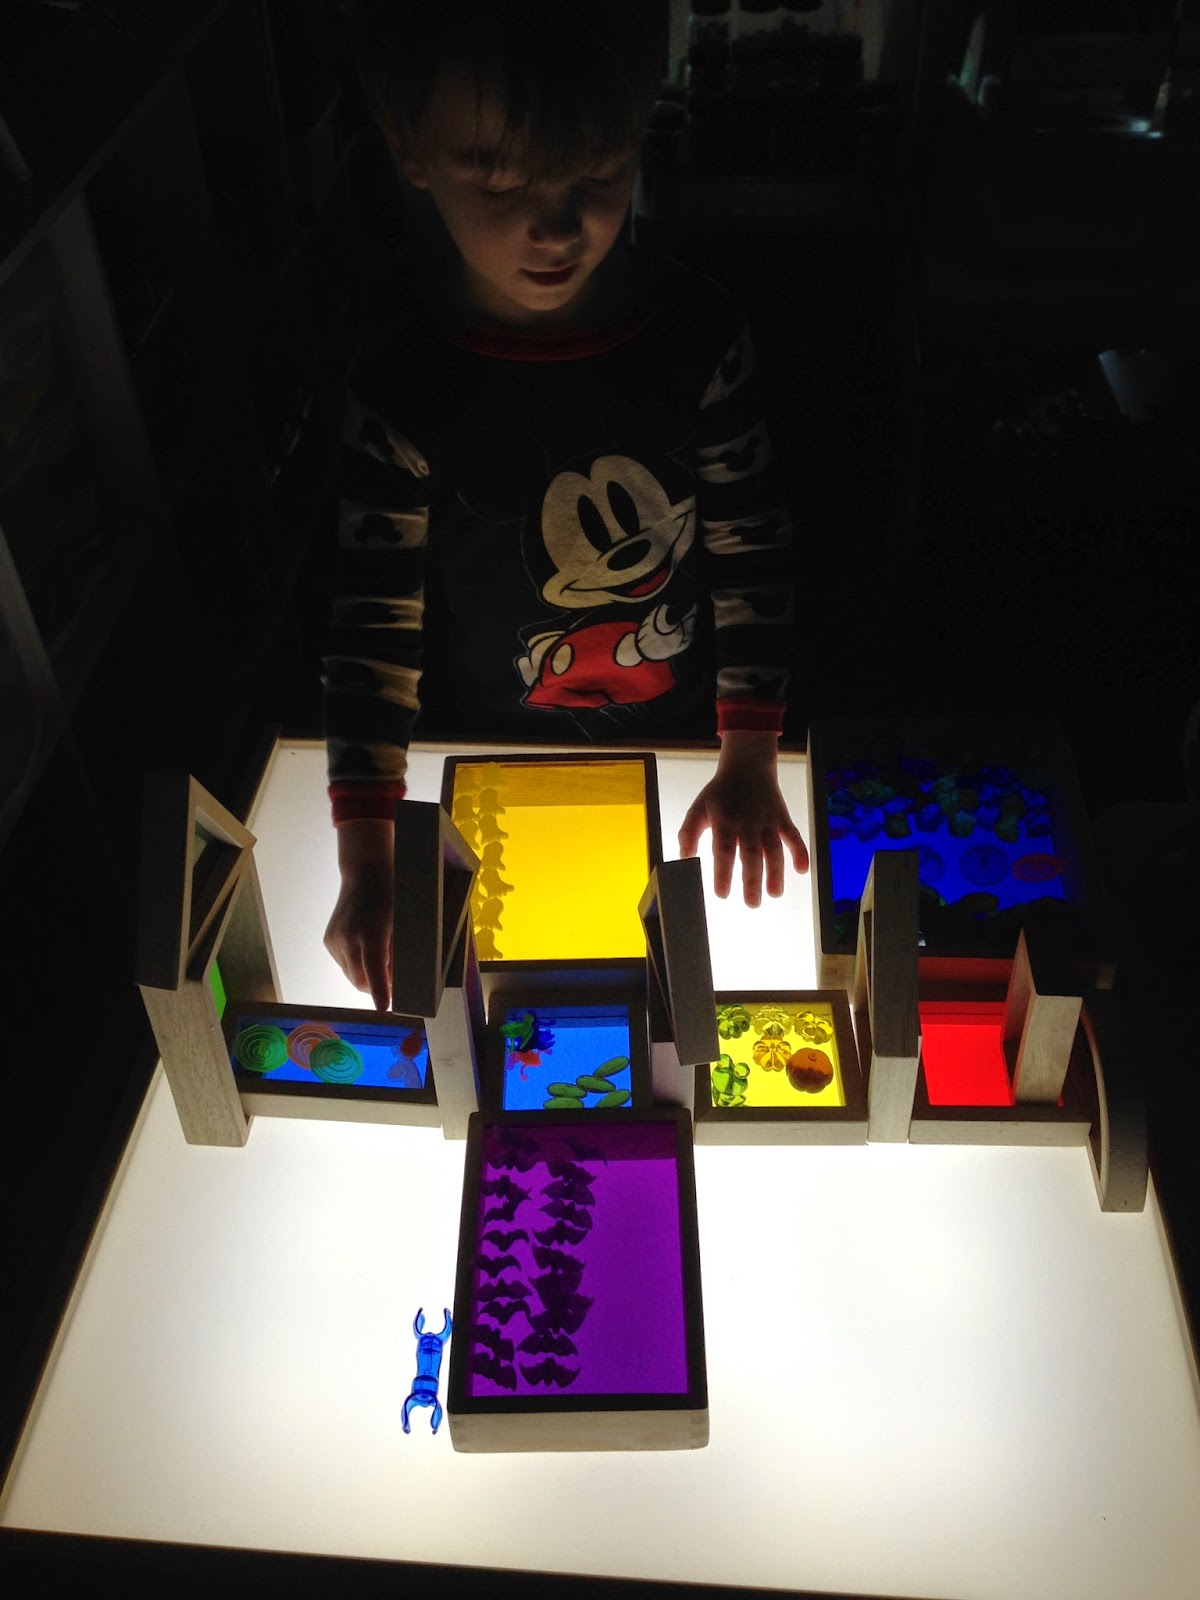 light table and window blocks